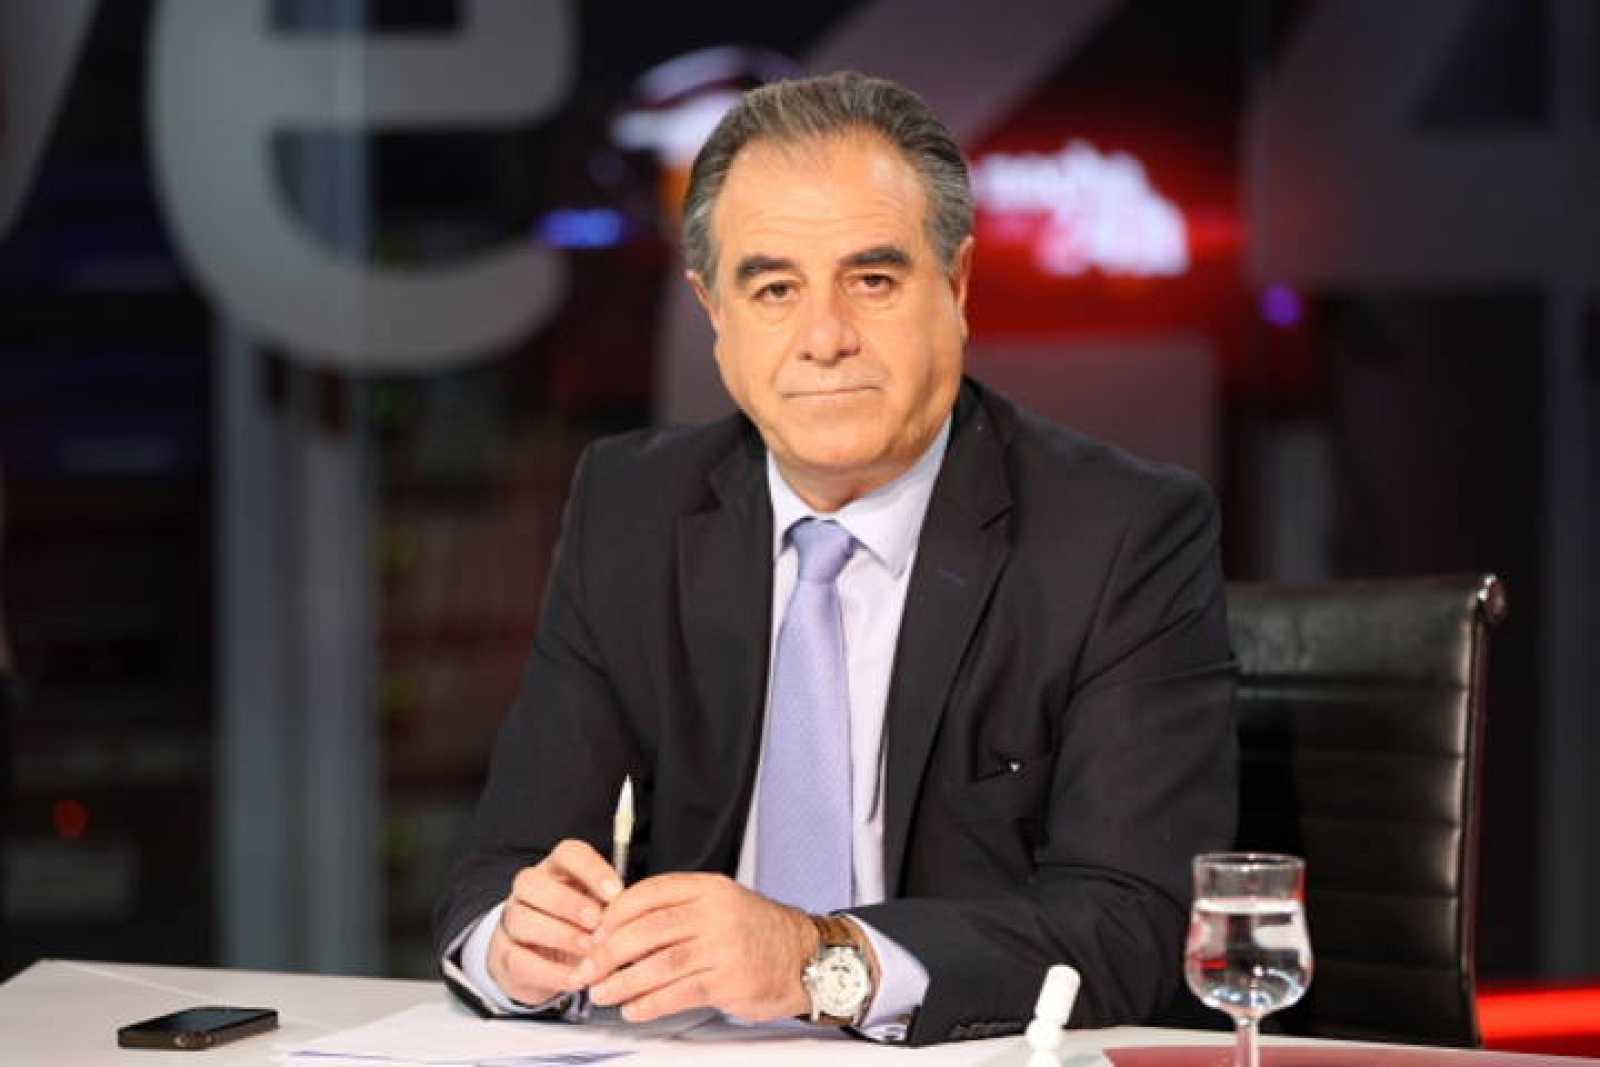 Graciano Palomo